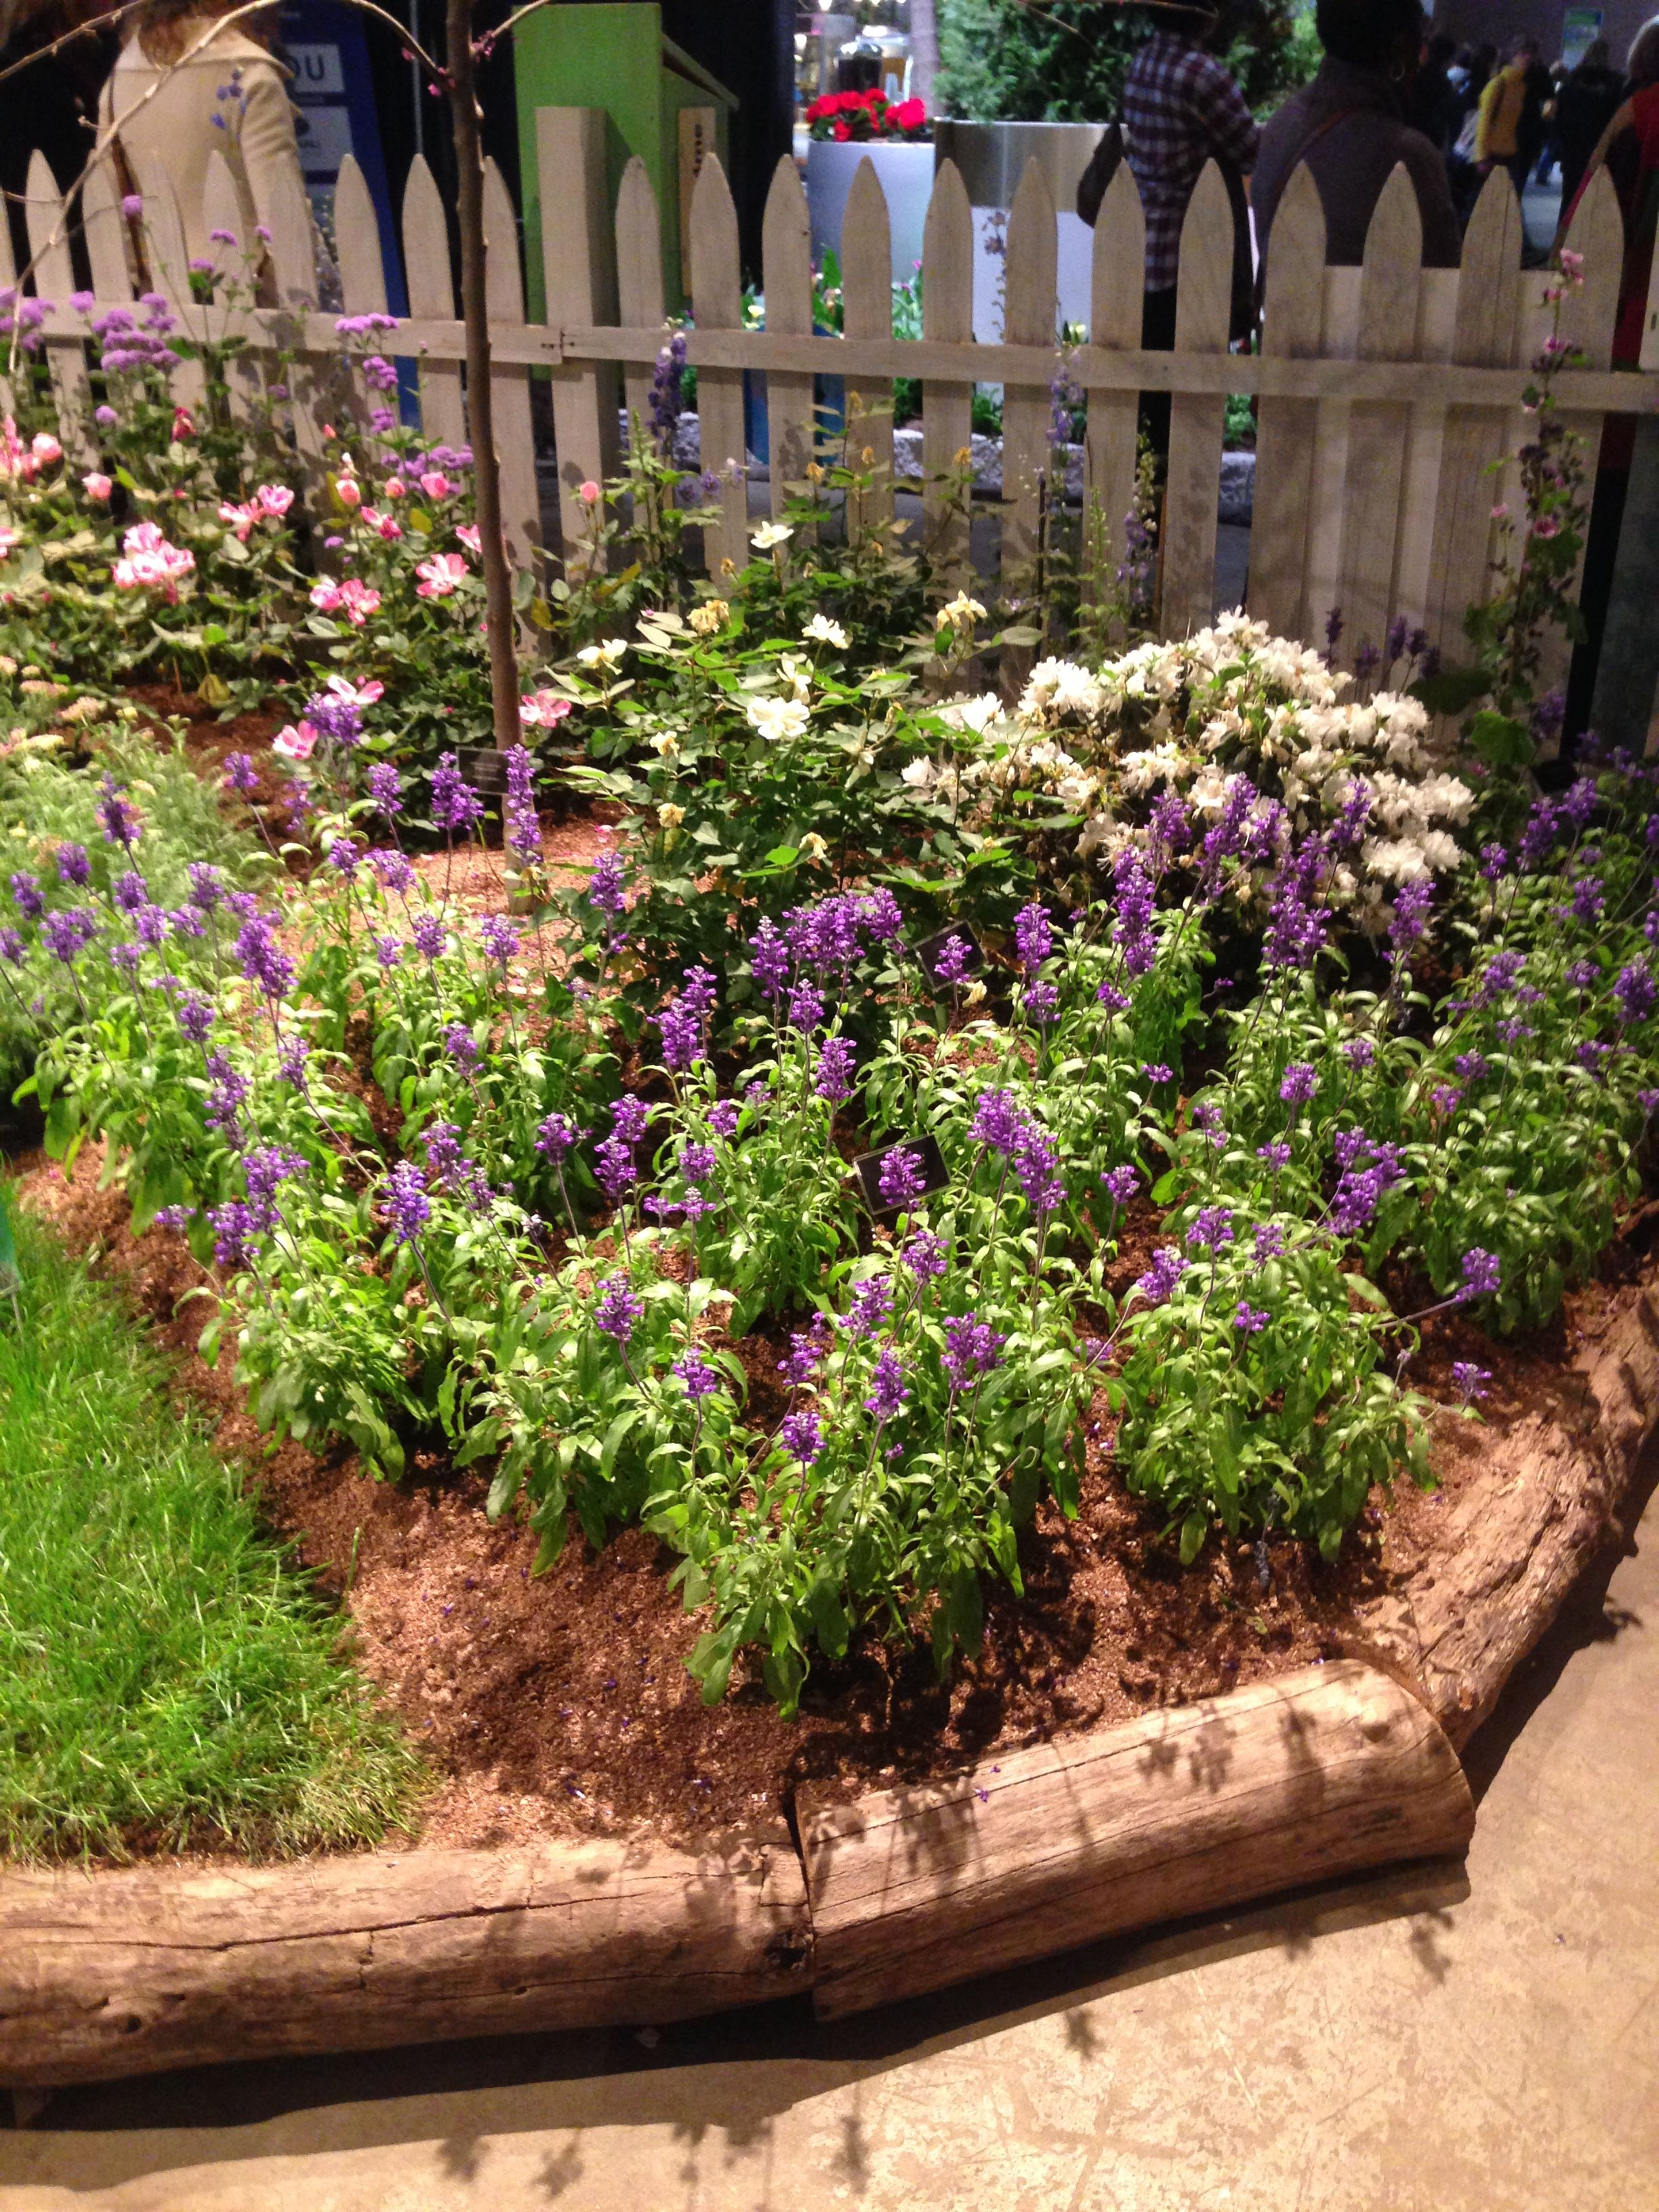 Garden Borders Inspiration : Inspiration for garden border using old logs outdoor